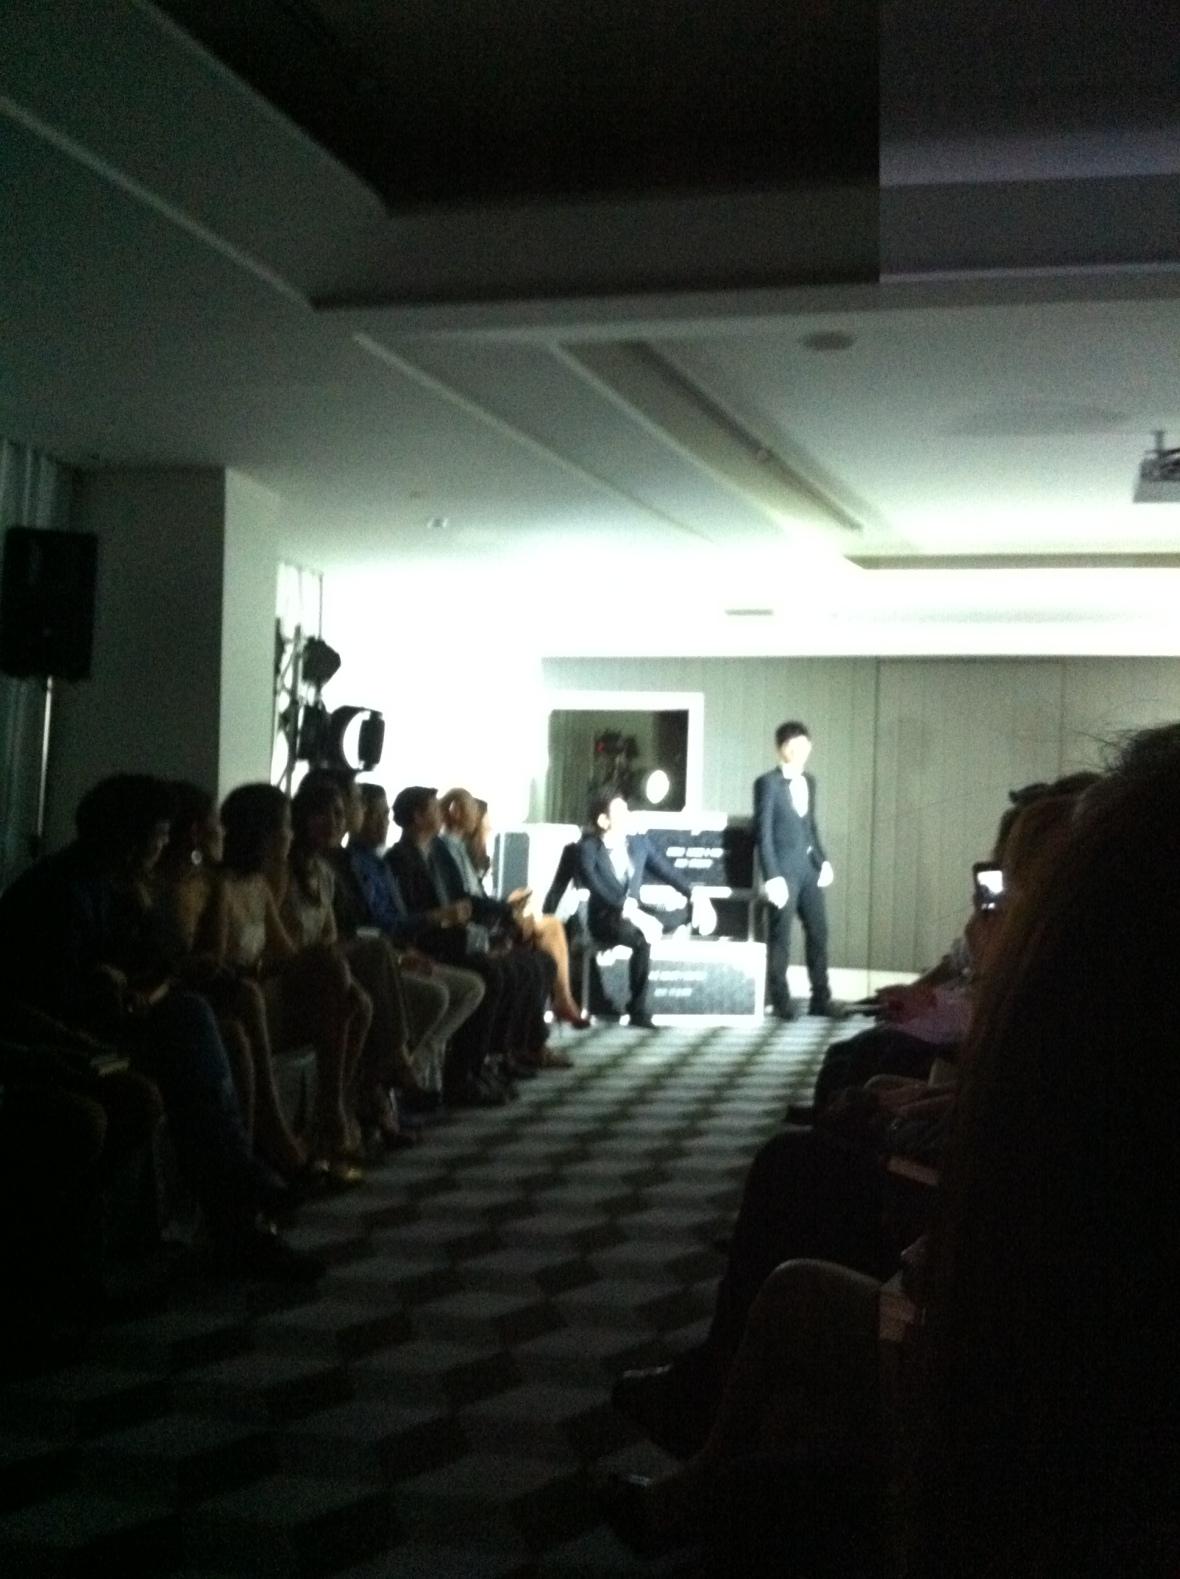 pq Eyewear by Ron Arad_Yayaying-Rhatha Phongam (ญาญ่าญิ๋ง-รฐา โพธิ์งาม)_New-Chaiyapol Julien Poupart (นิว ชัยพล จูเลี่ยน พูพาร์ค)_MSI_Modeling_08